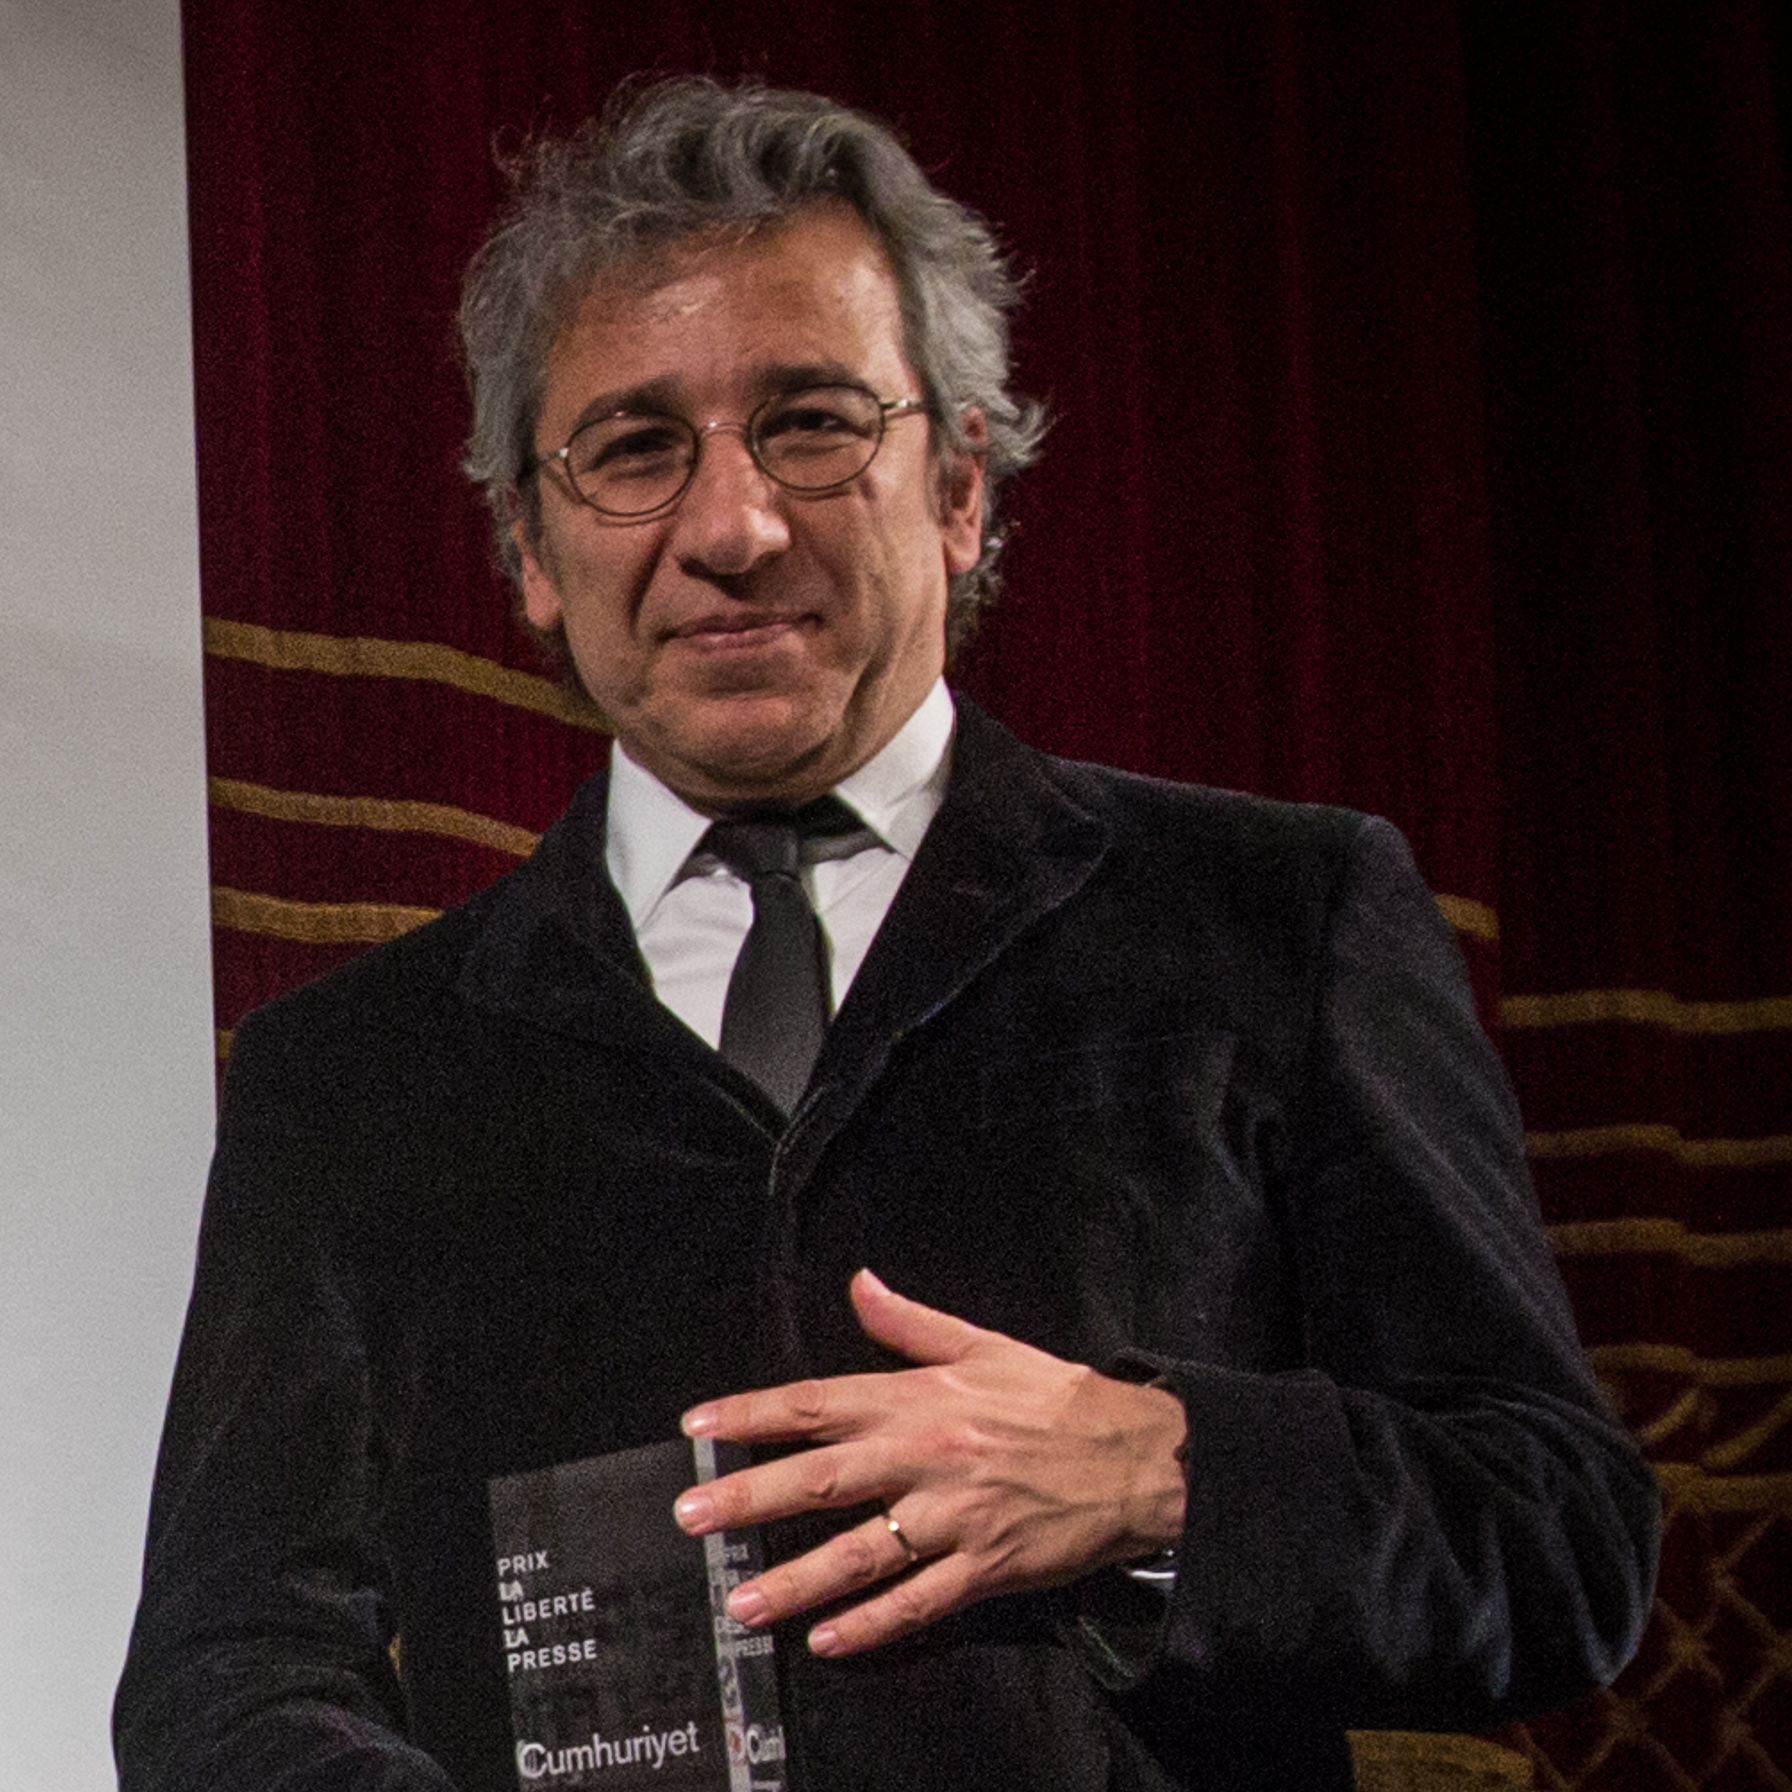 Photo of Can Dündar: Turkish journalist